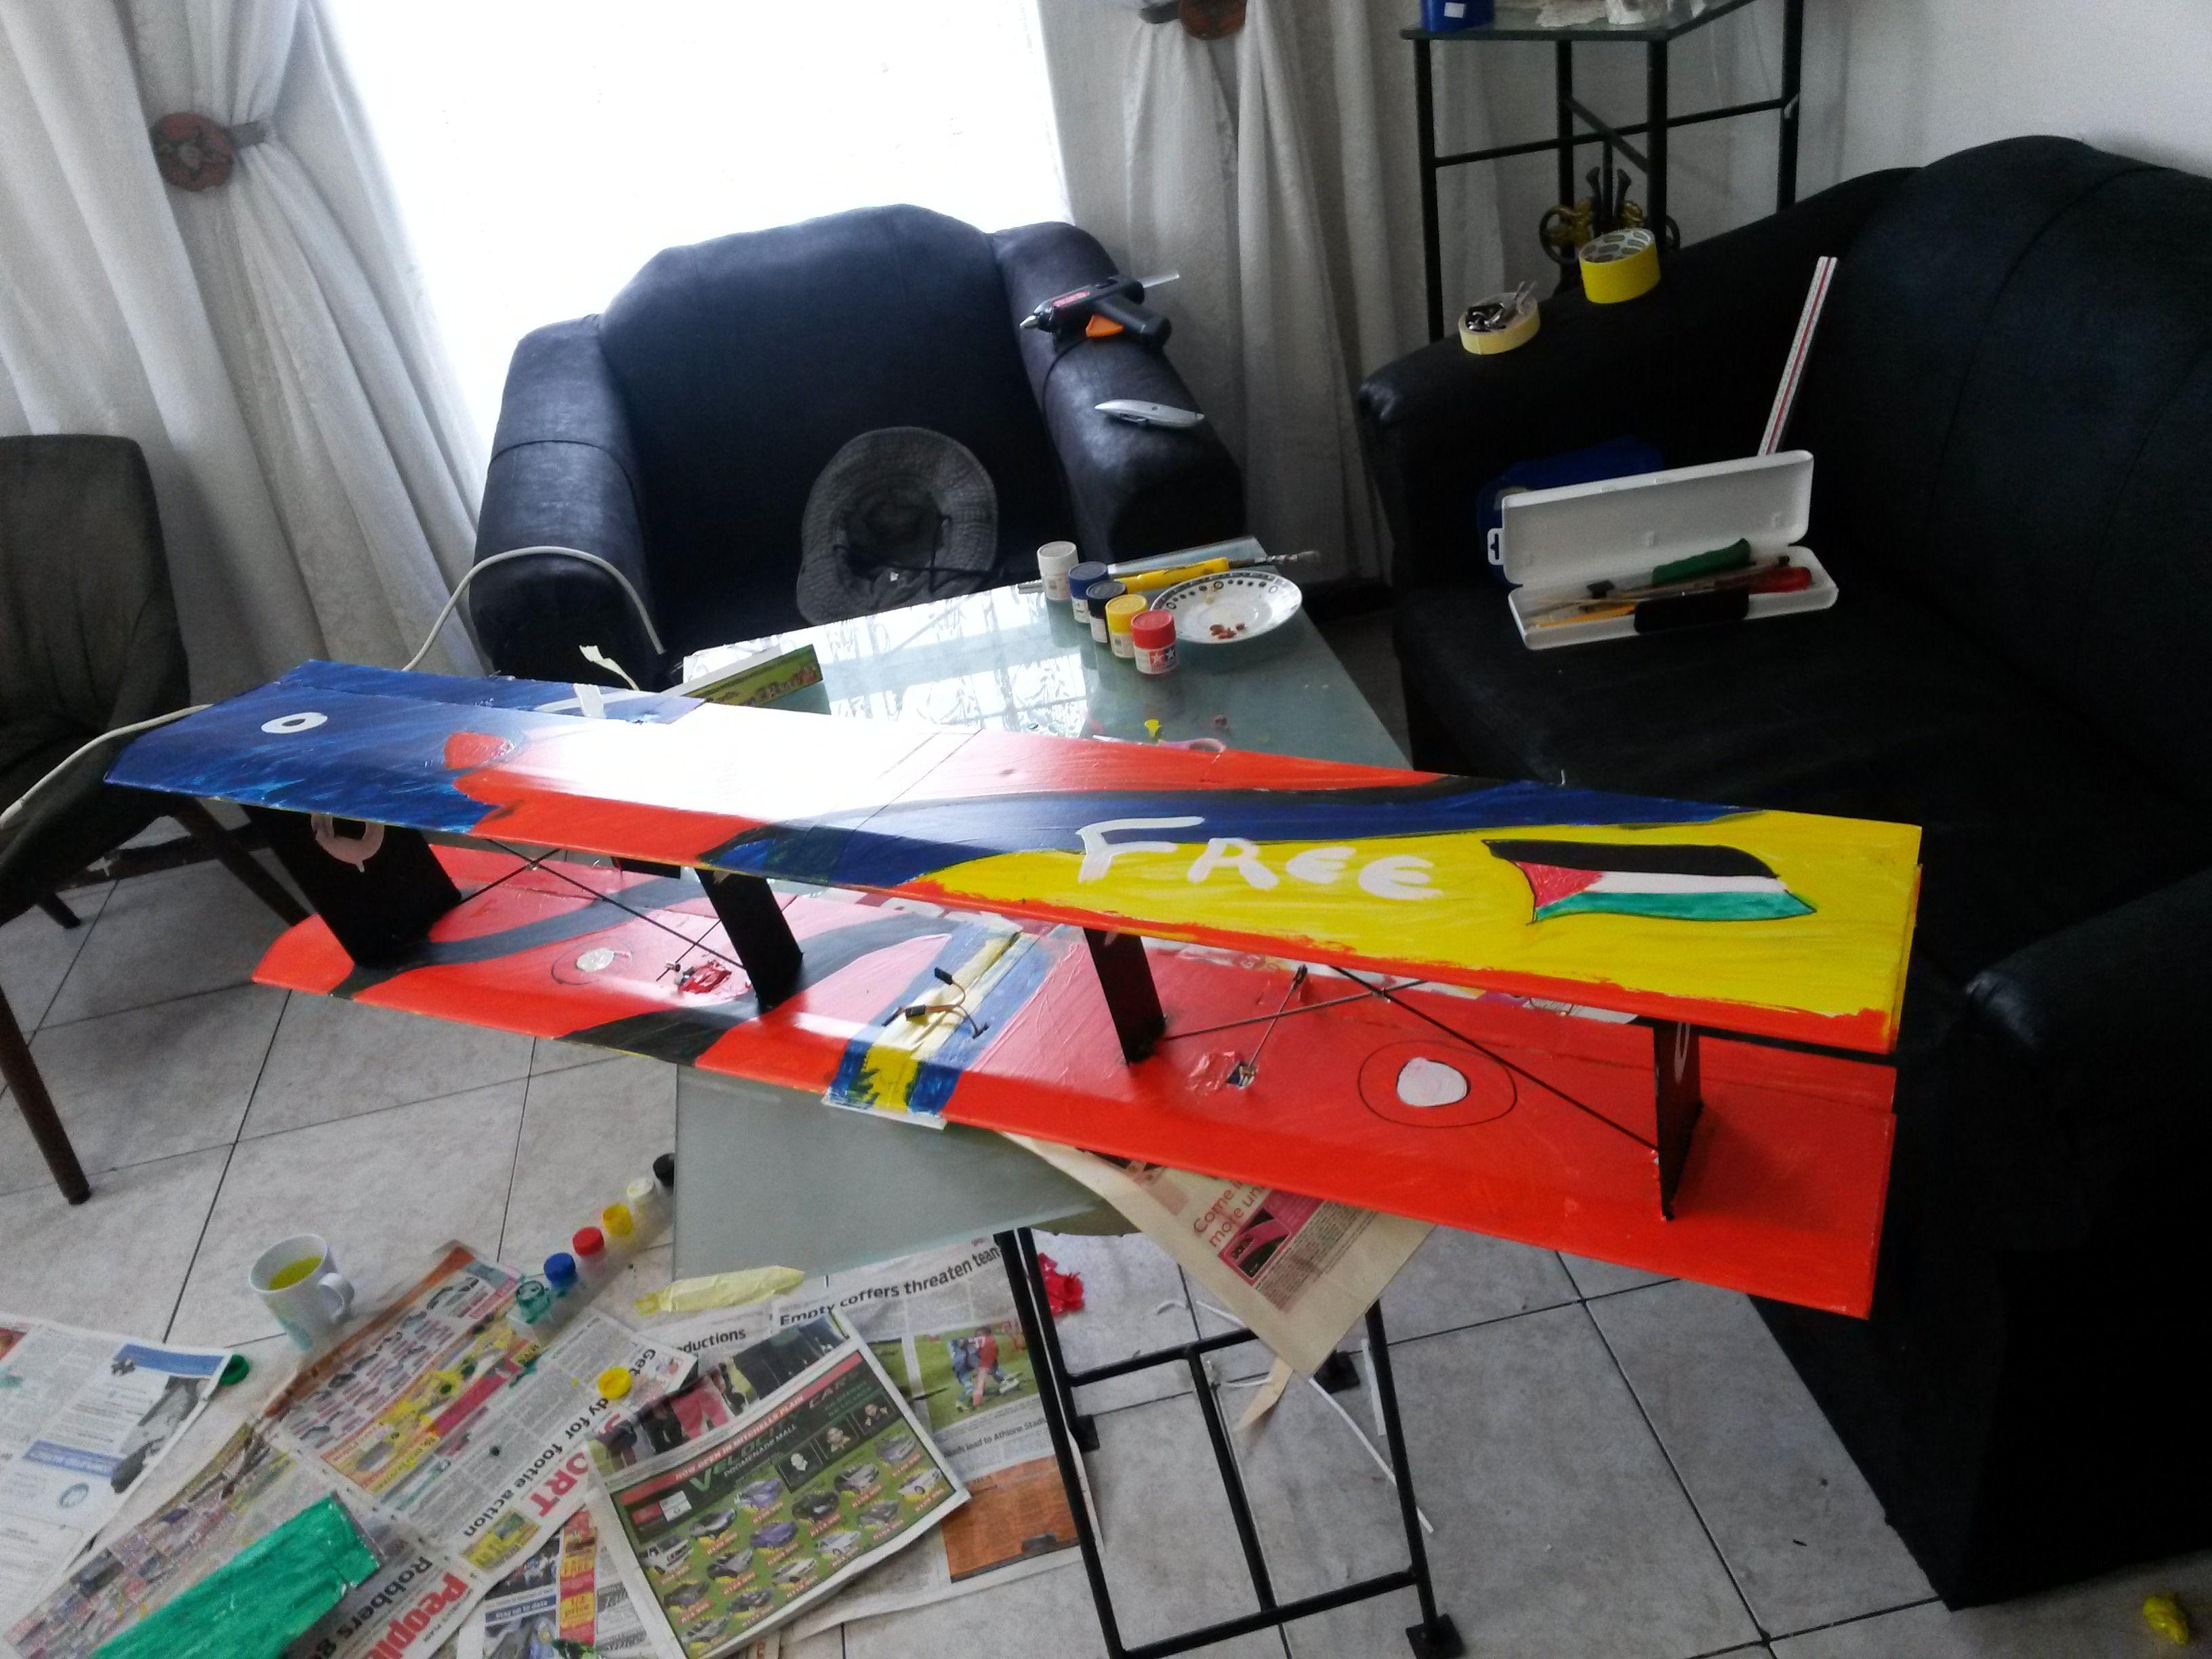 Pin on Scratchbuilt RC Planes